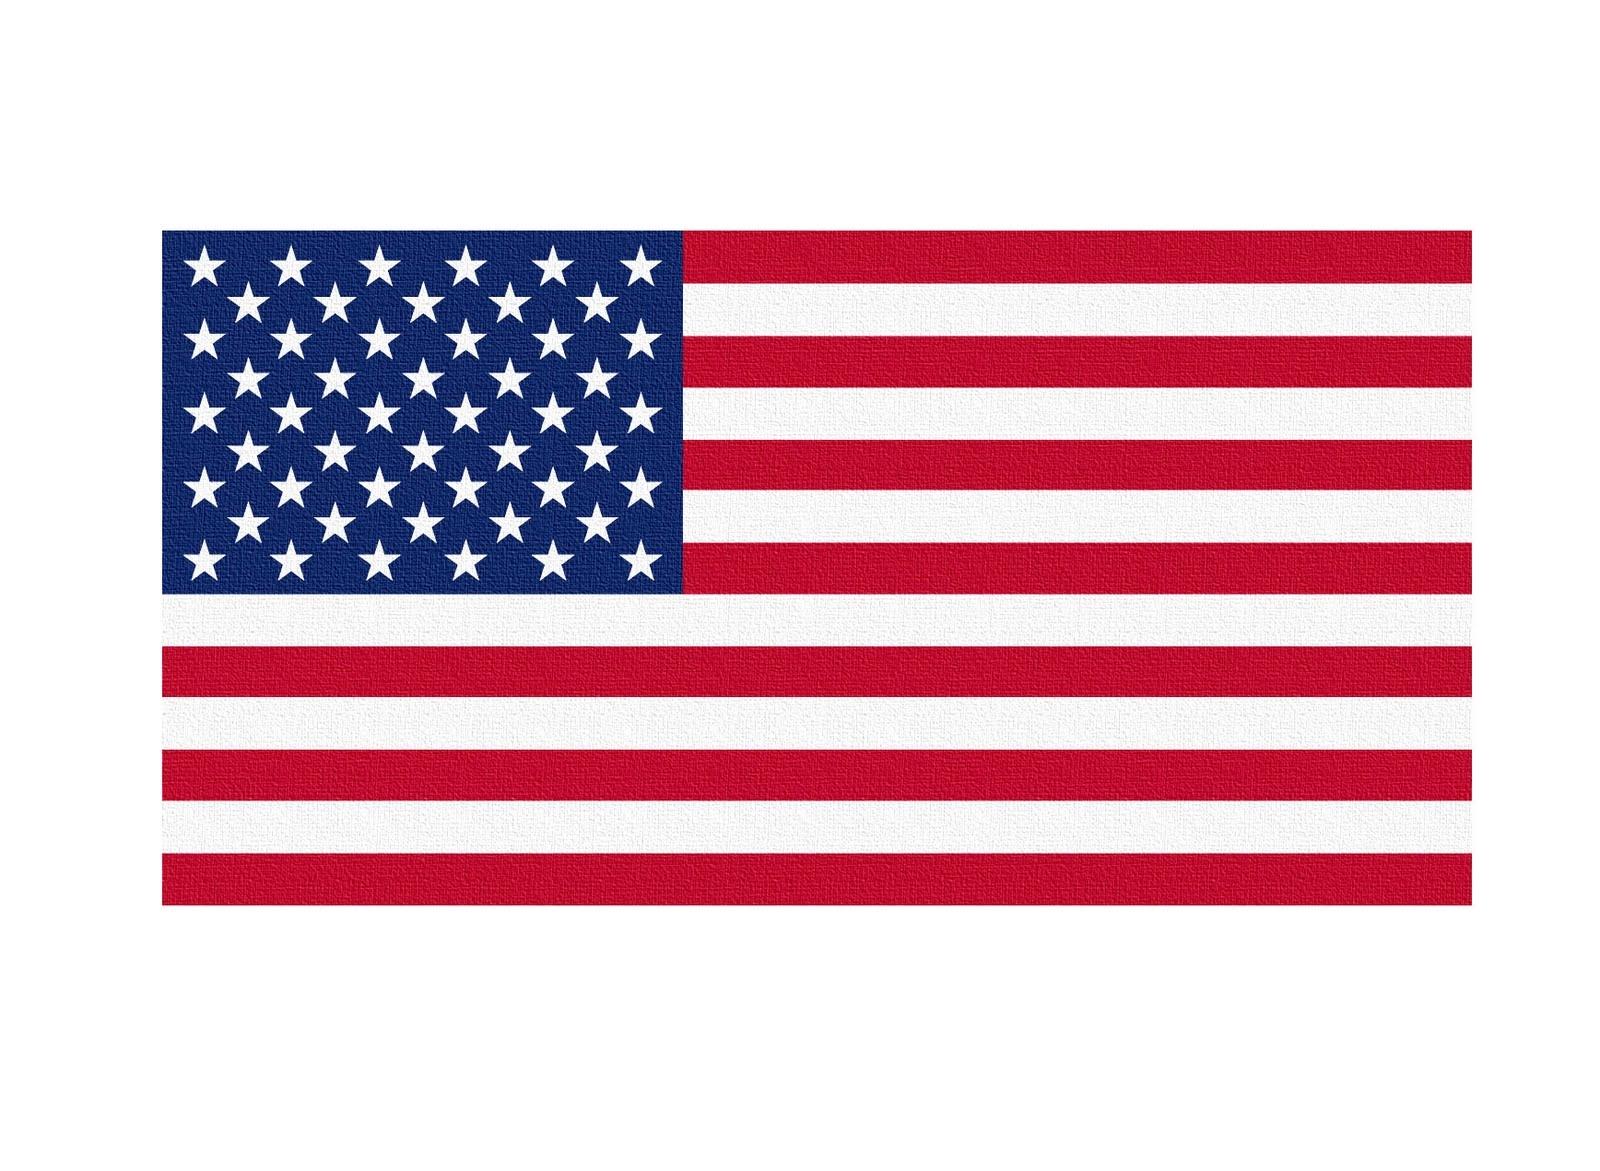 american flag vintage vector - photo #33